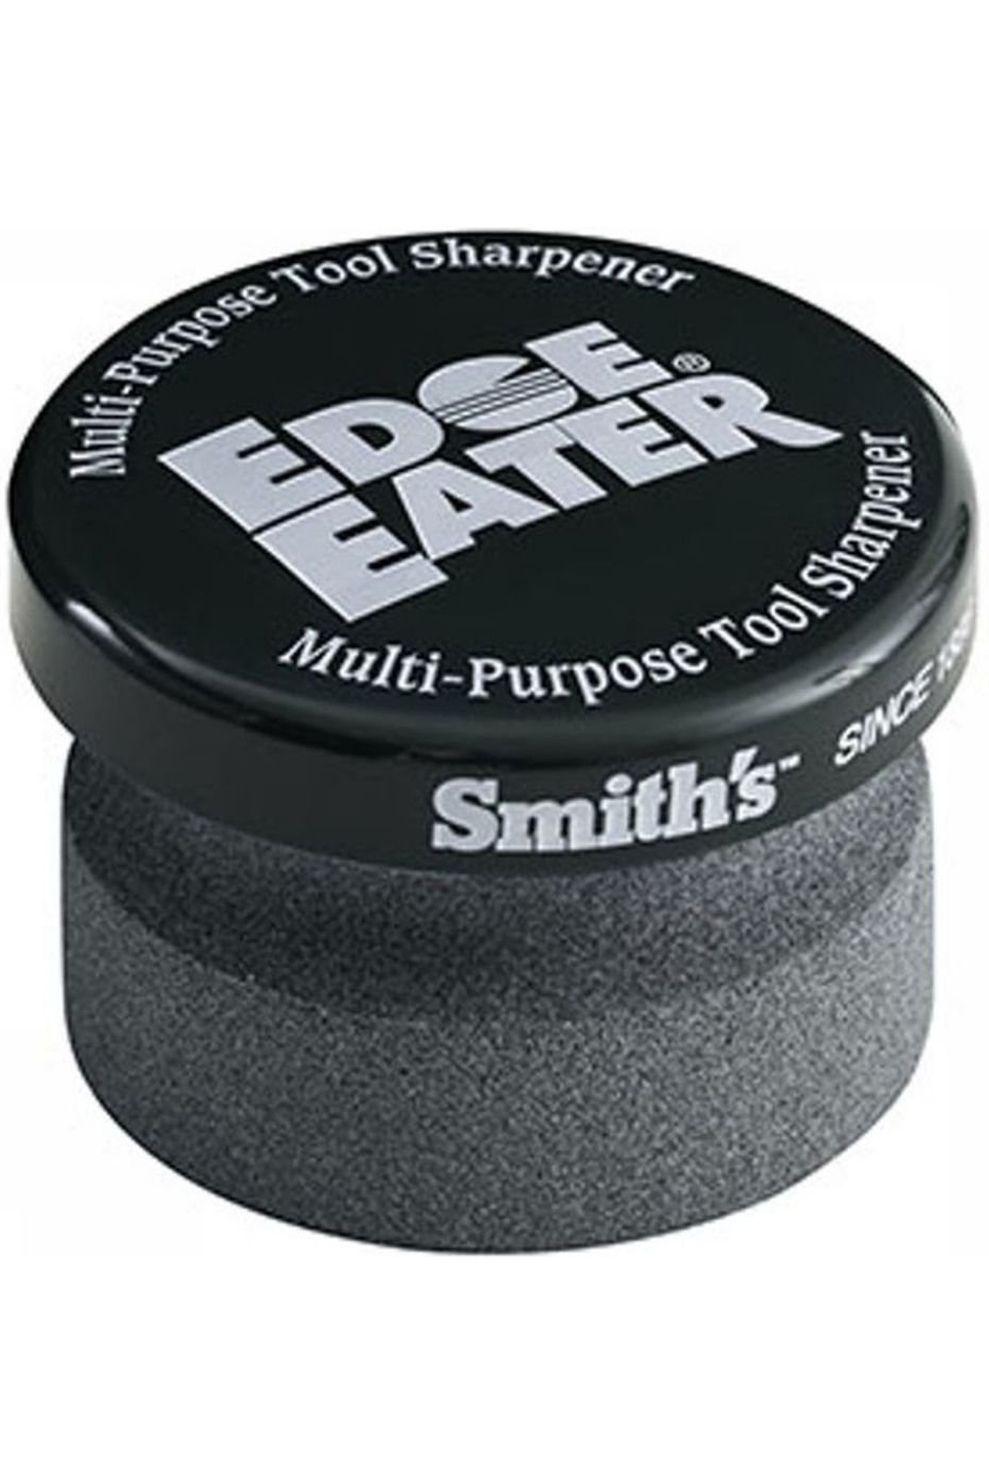 Smith's Edge Eater Multi-Purpose Tool Sharpener - Zwart/Grijs